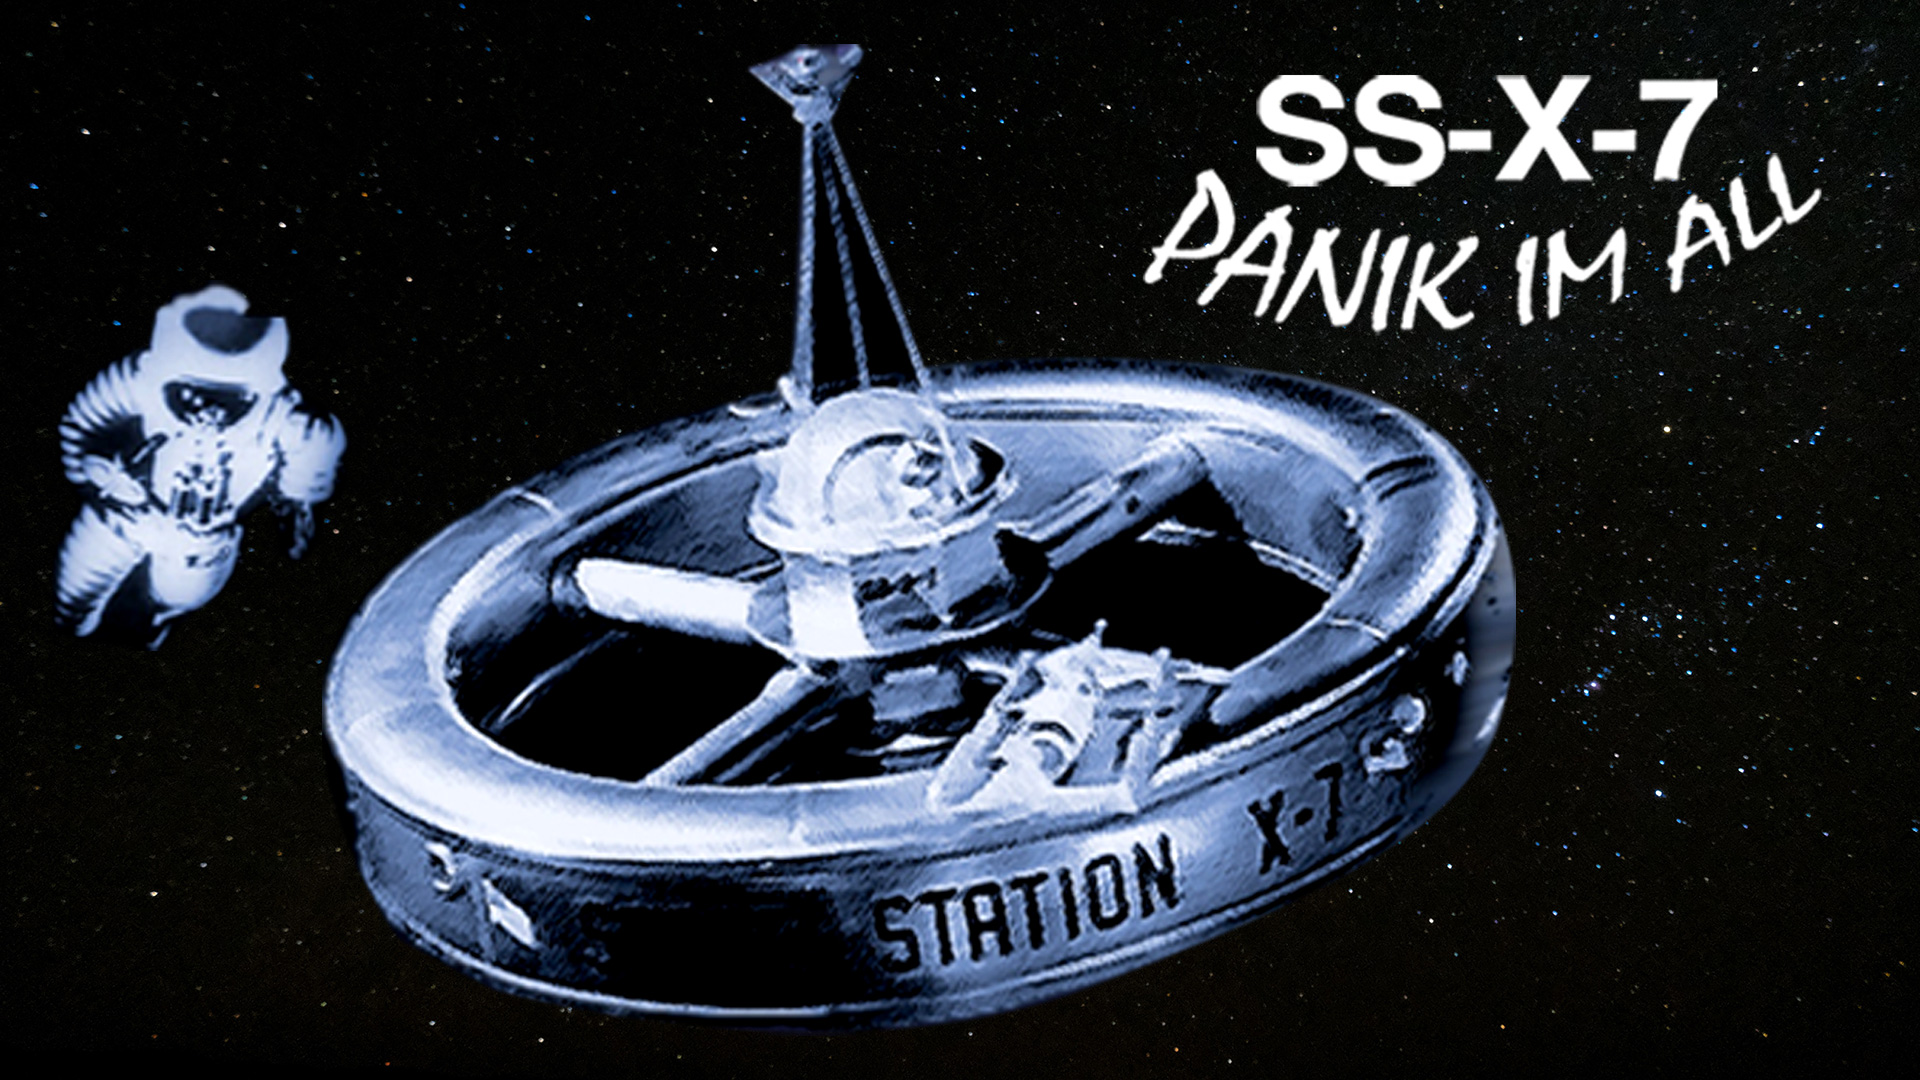 SS-X-7 Panik im All